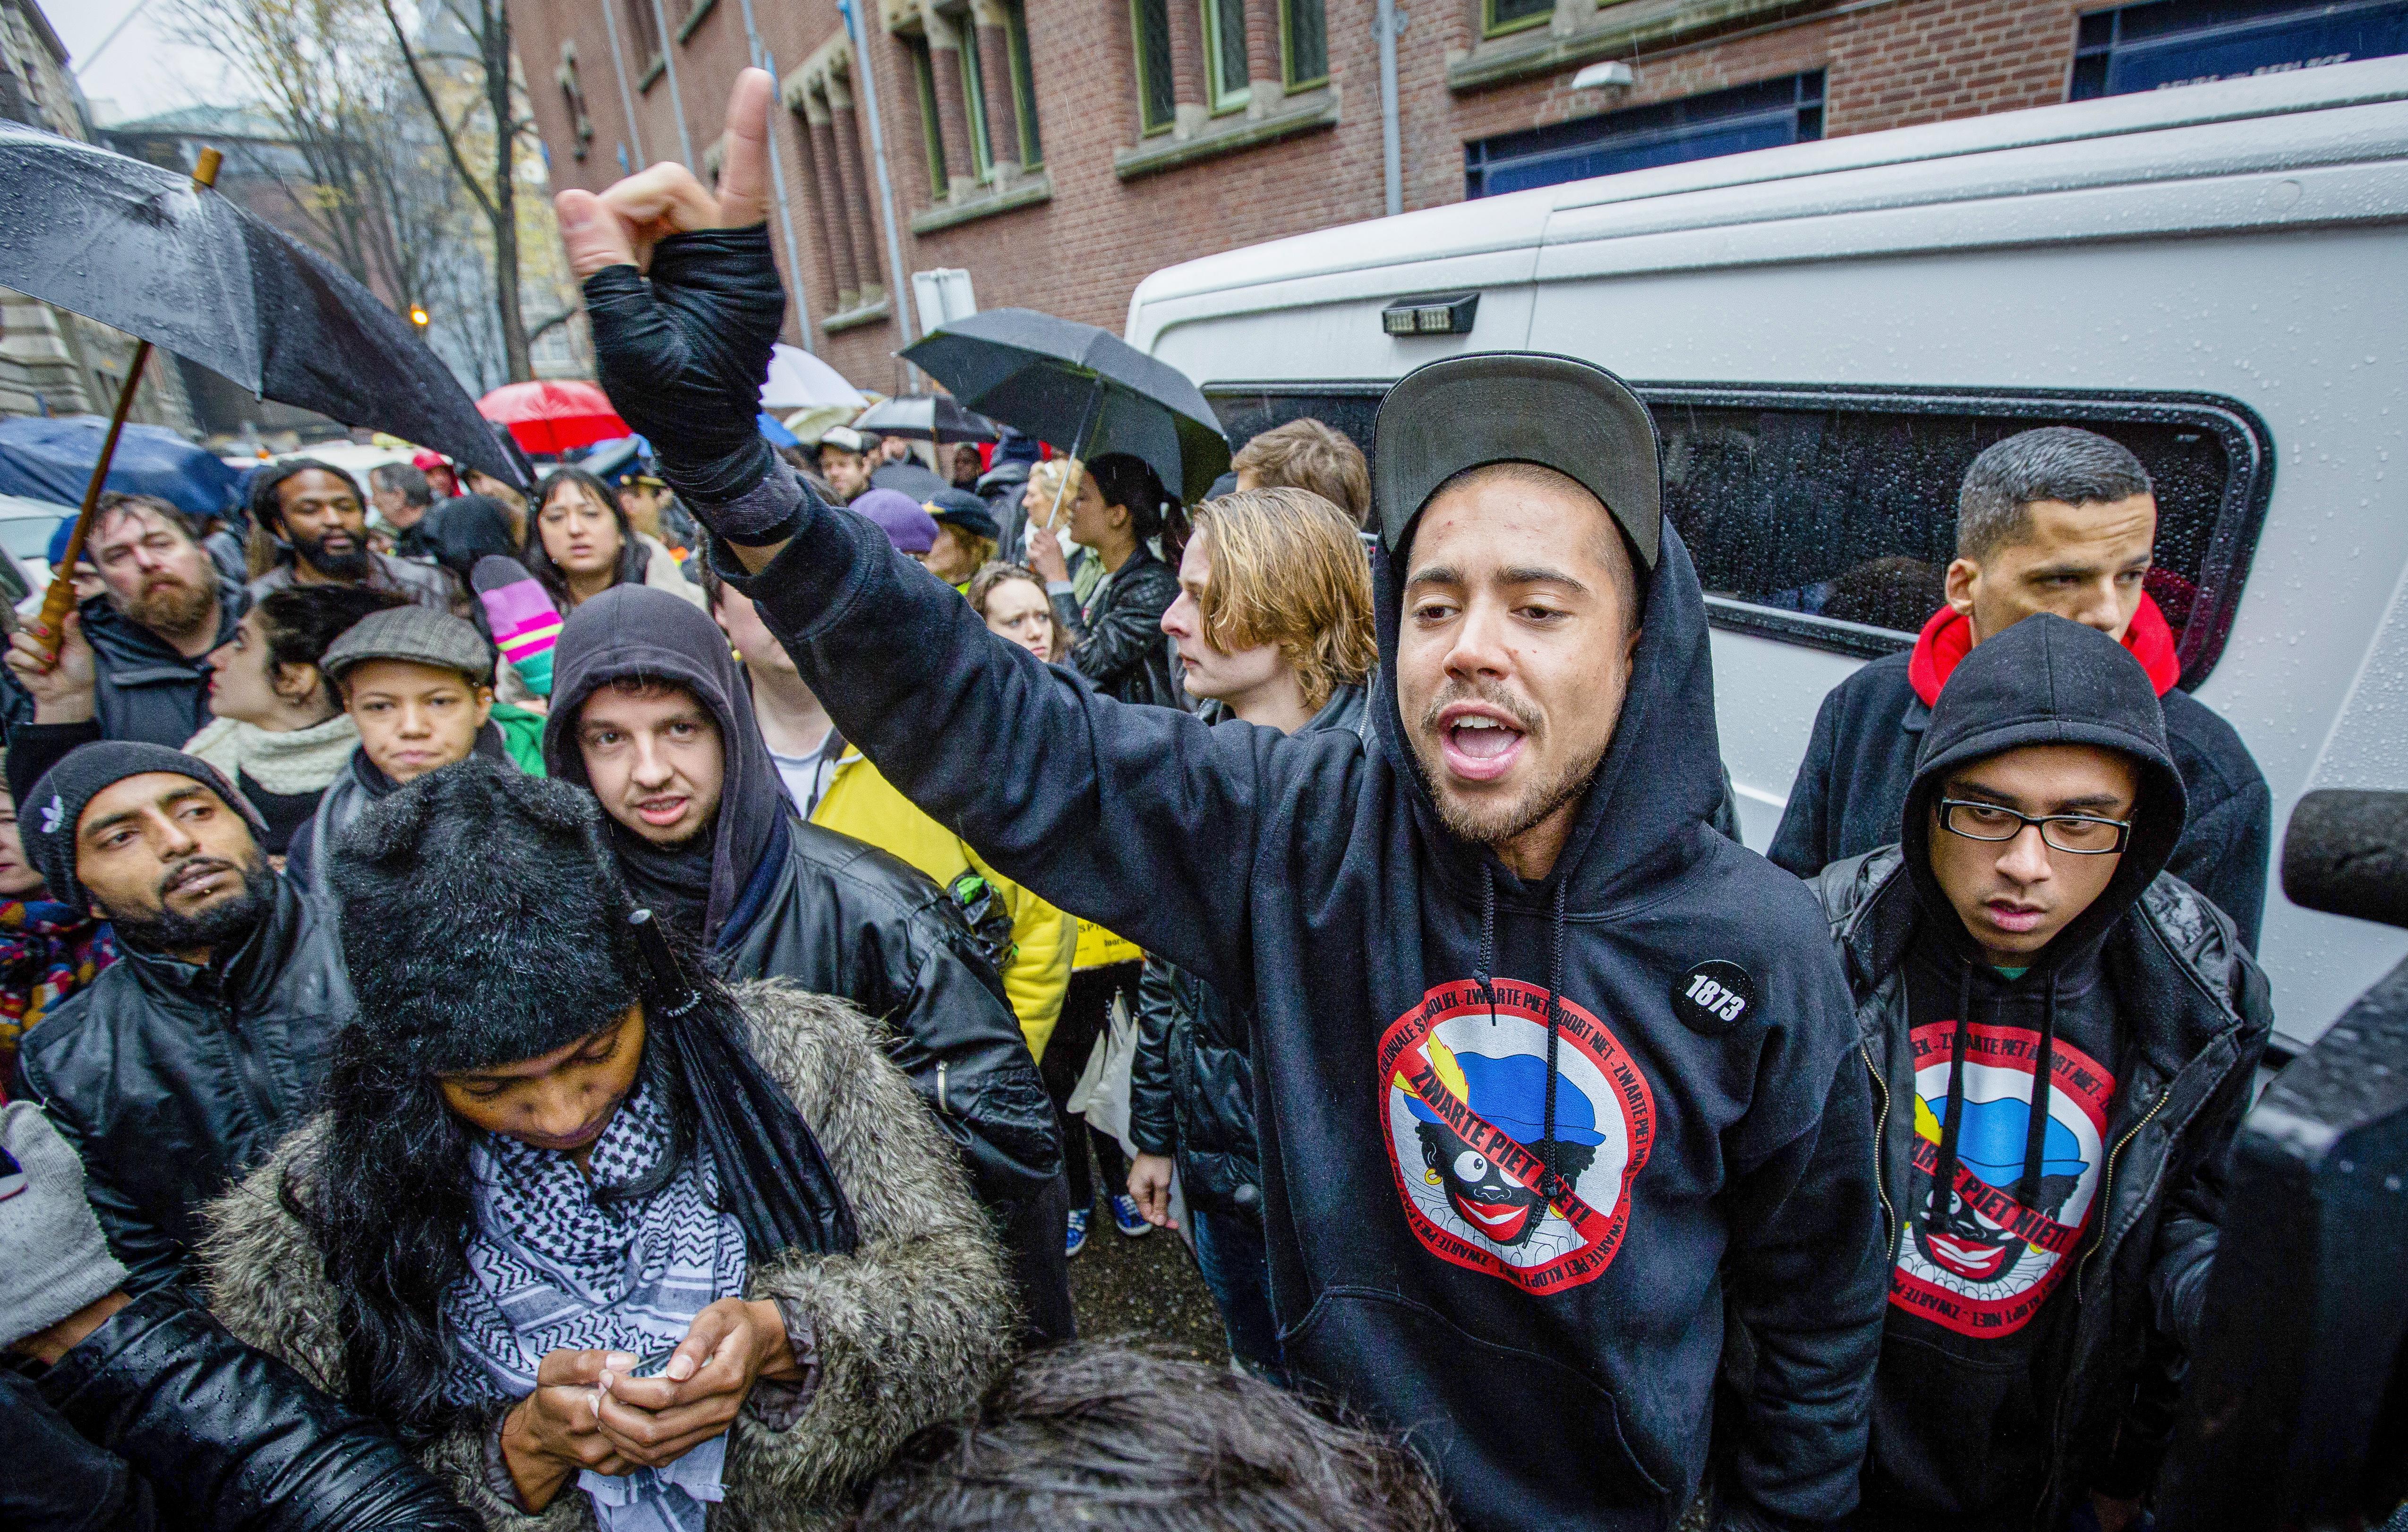 Nieuwe stadsdichter Haarlem onder vuur om Holocaust-teksten